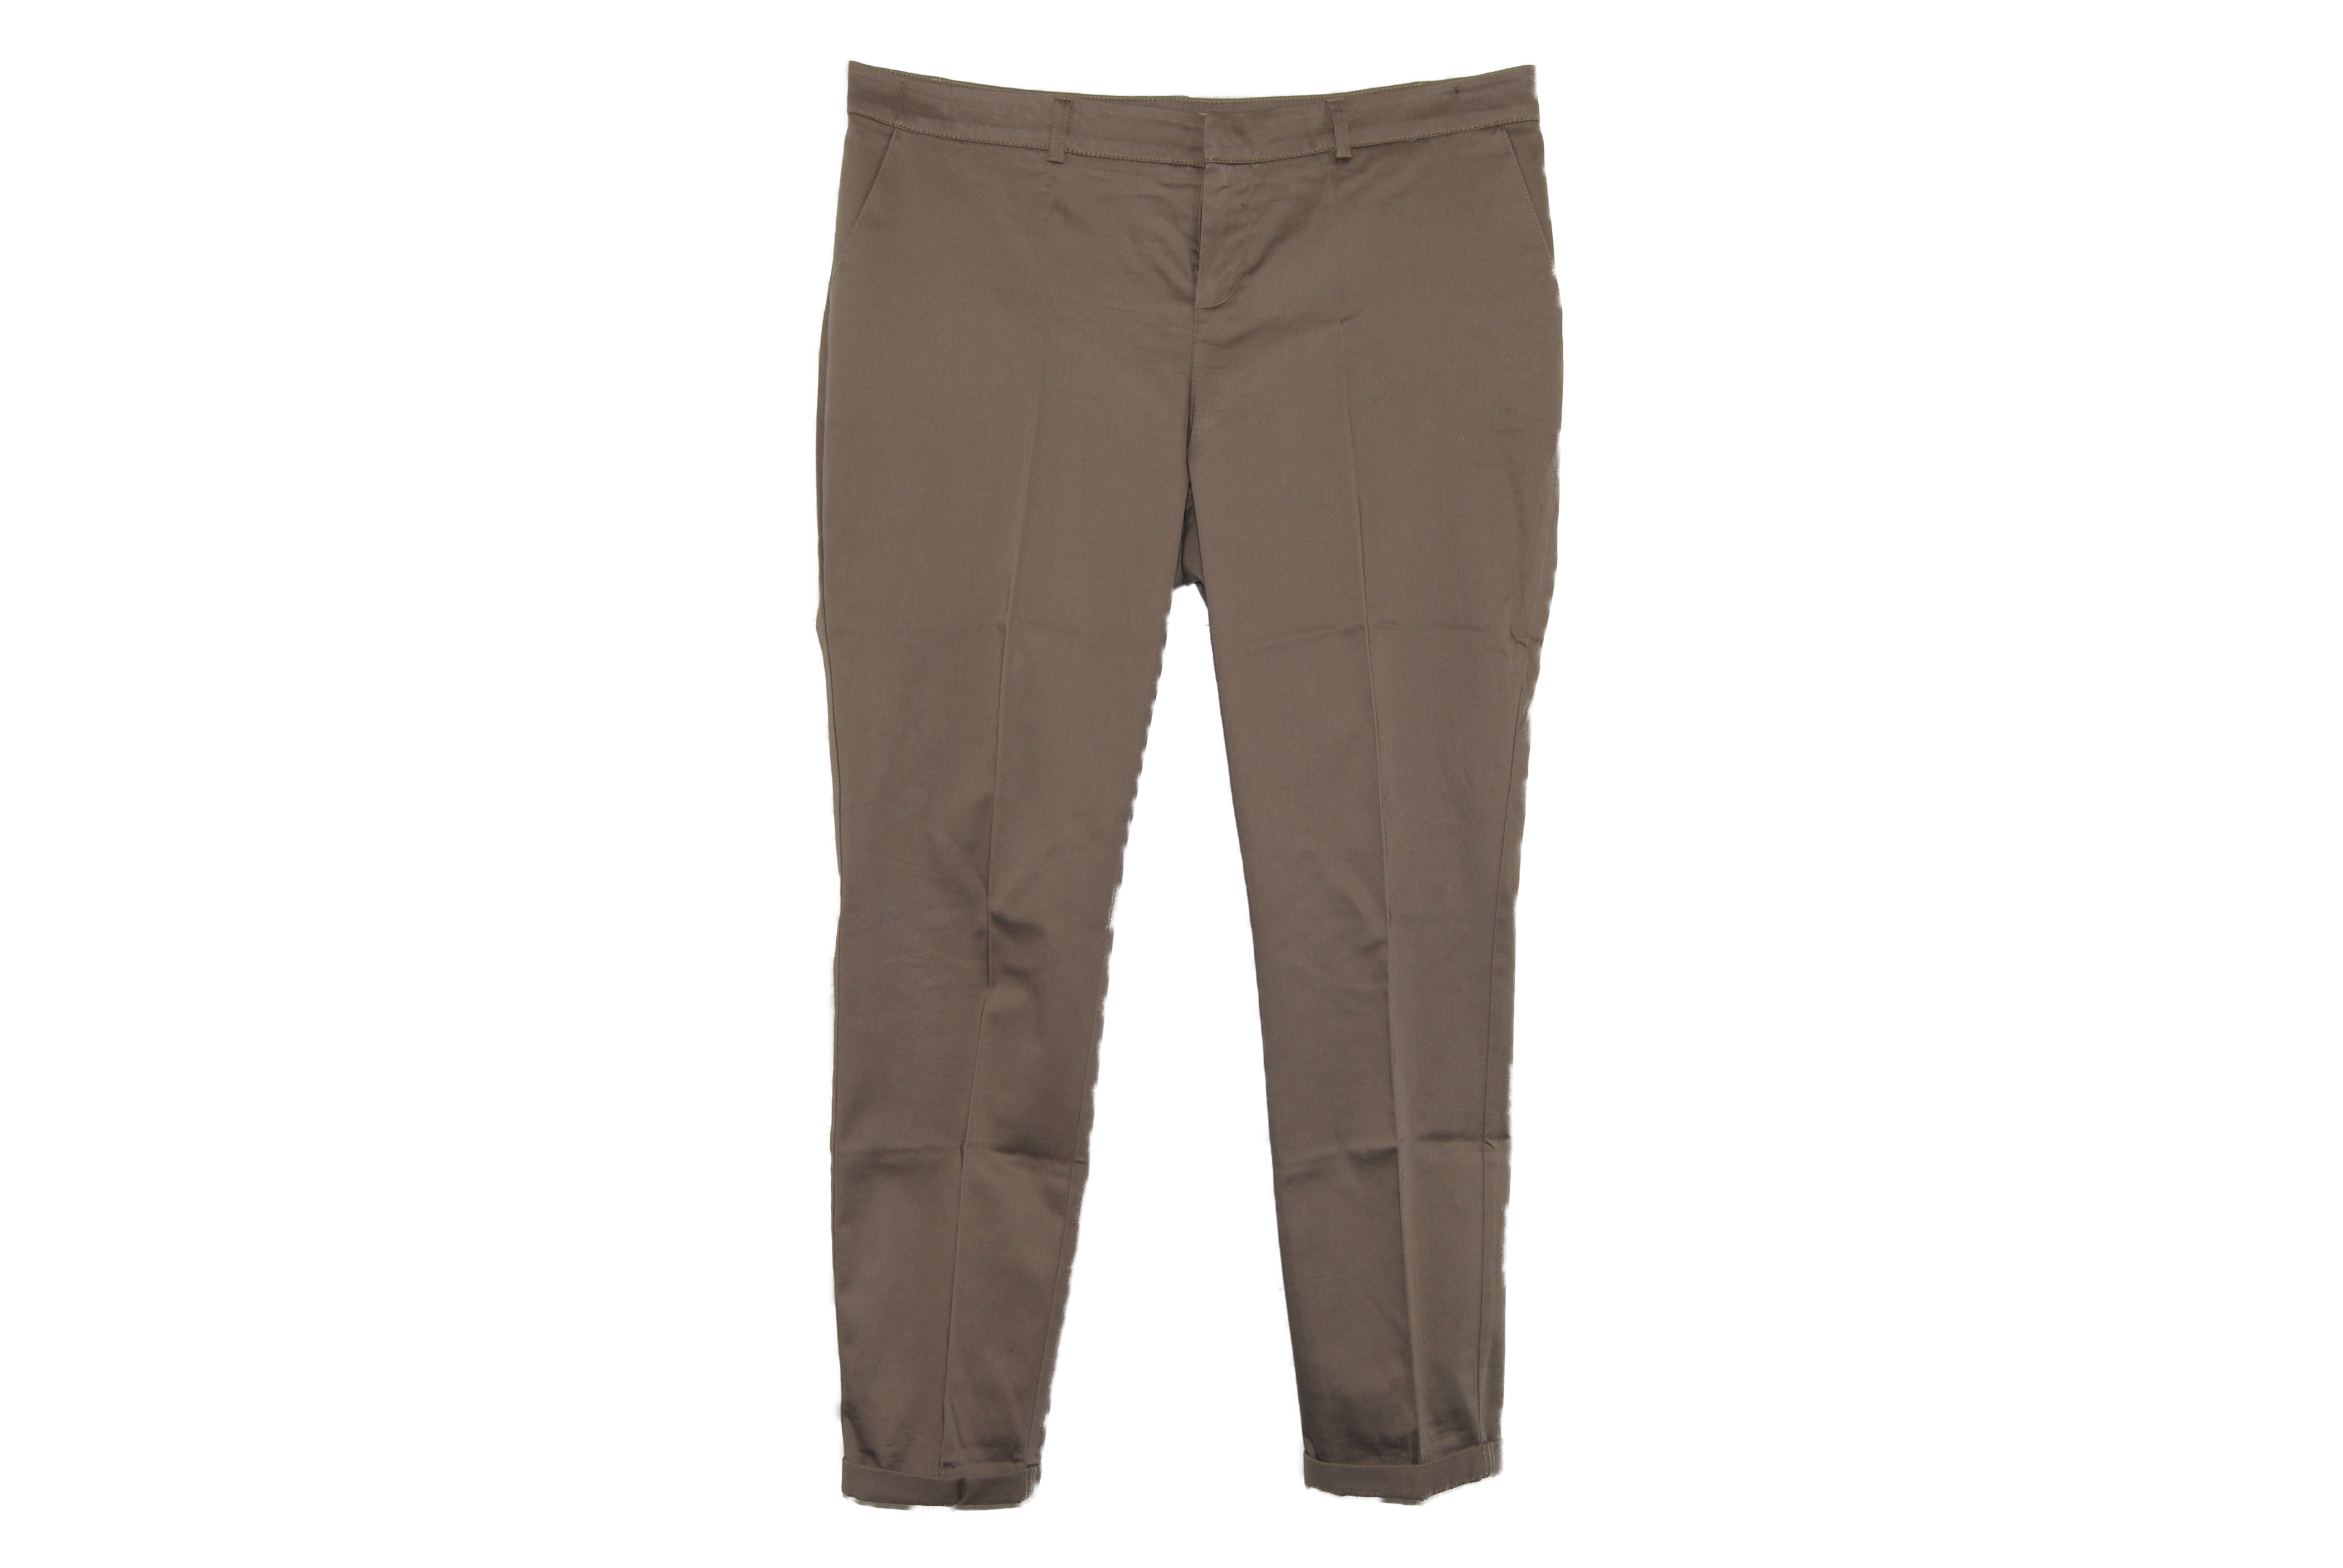 c8f3d098485145 Pantalon Grain de Malice, taille 44